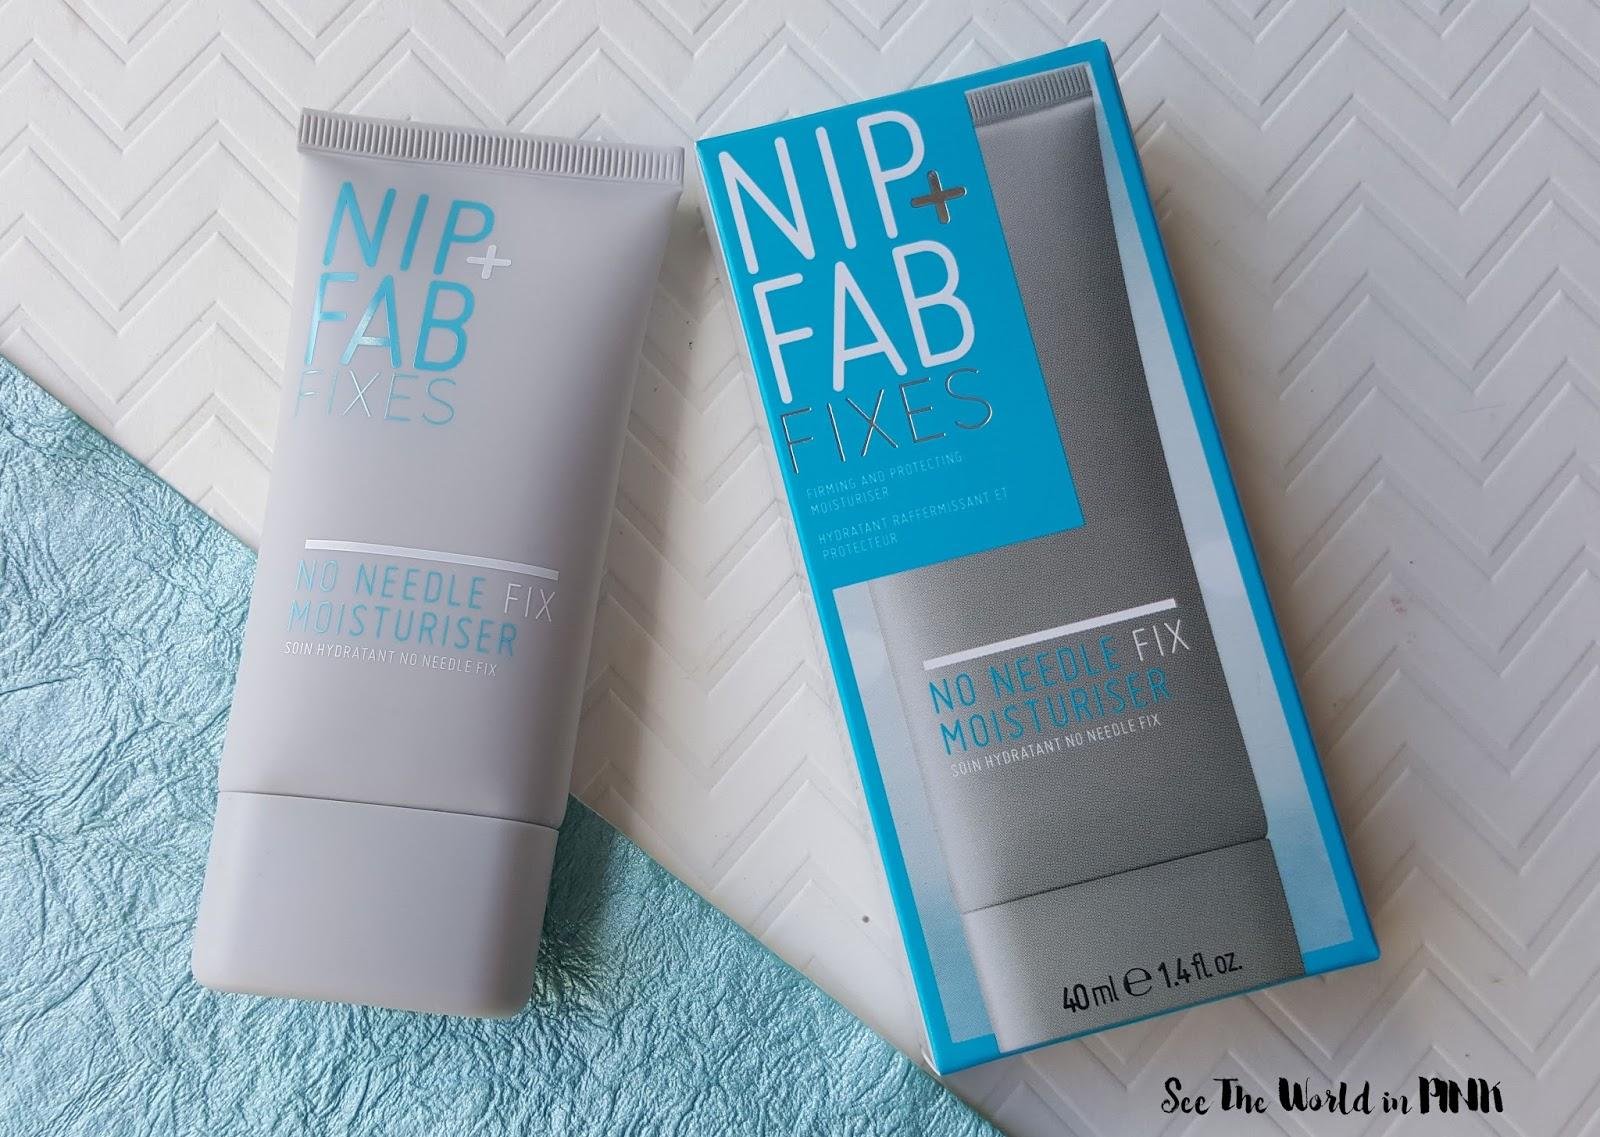 Skincare Sunday - Nip + Fab No Needle Fix Eye and Moisturiser